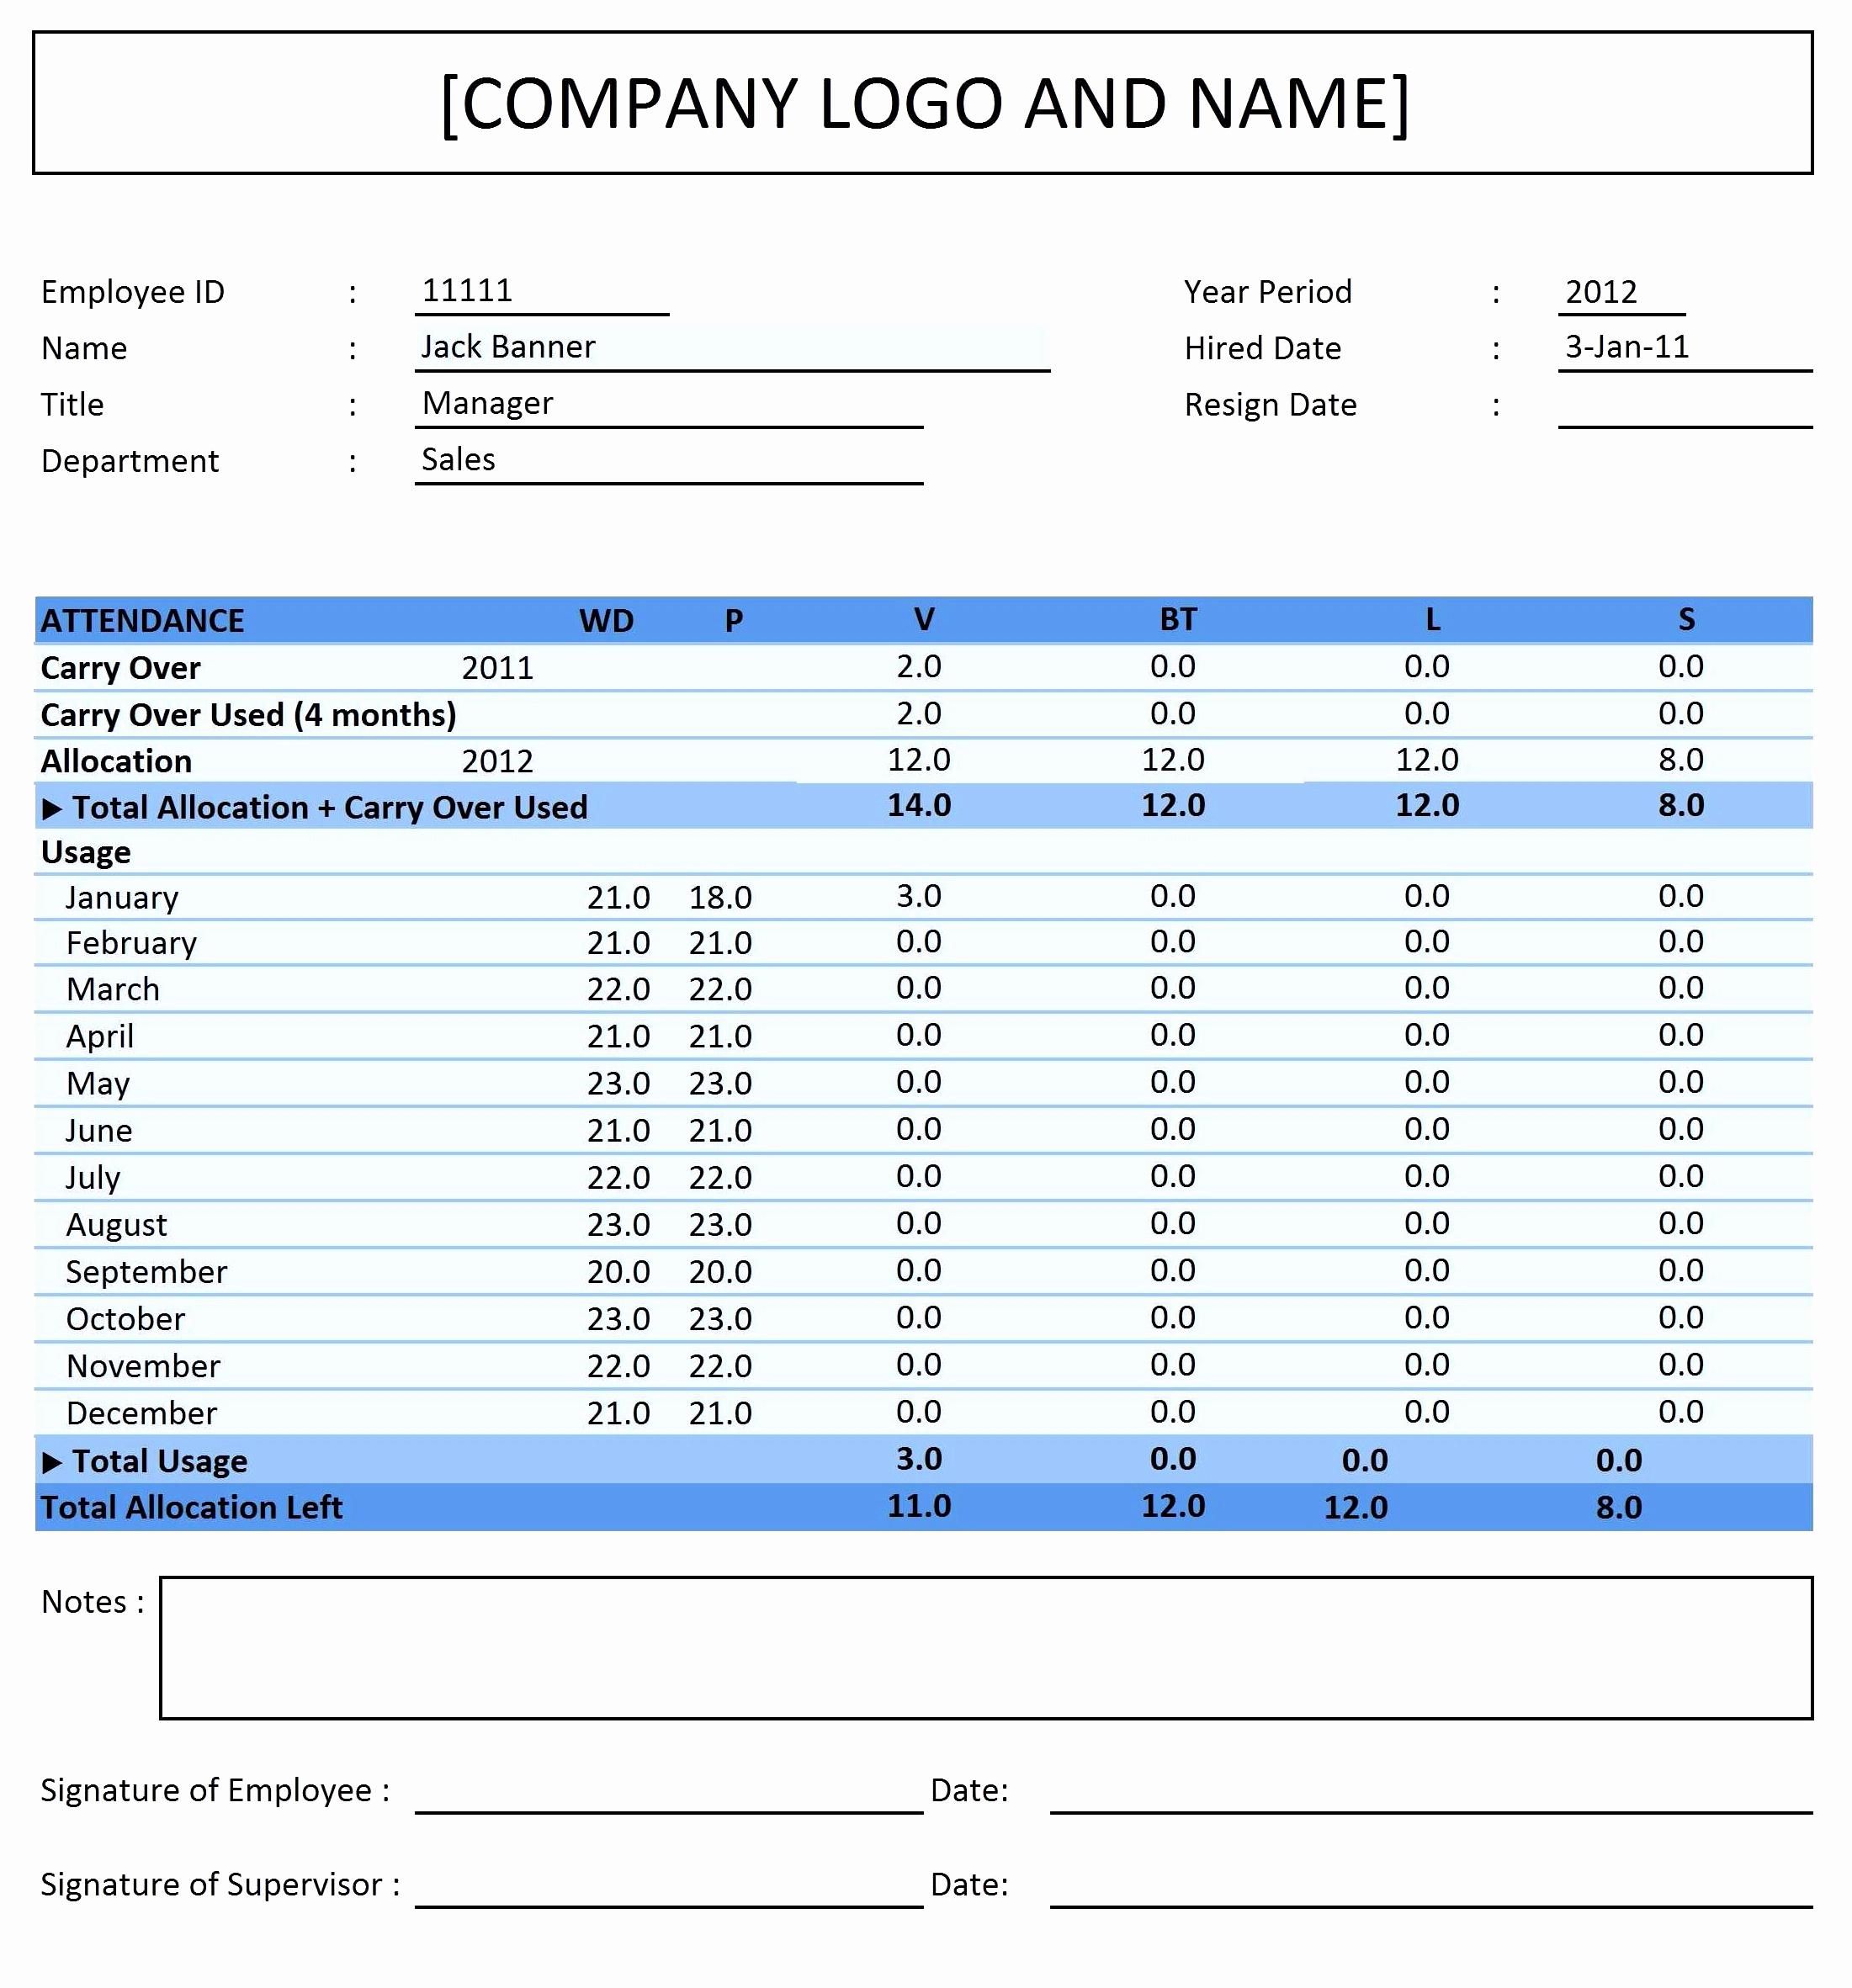 Fmla Rolling Calendar Tracking Spreadsheet Luxury 50 Luxury Fmla Intended For Fmla Tracking Spreadsheet